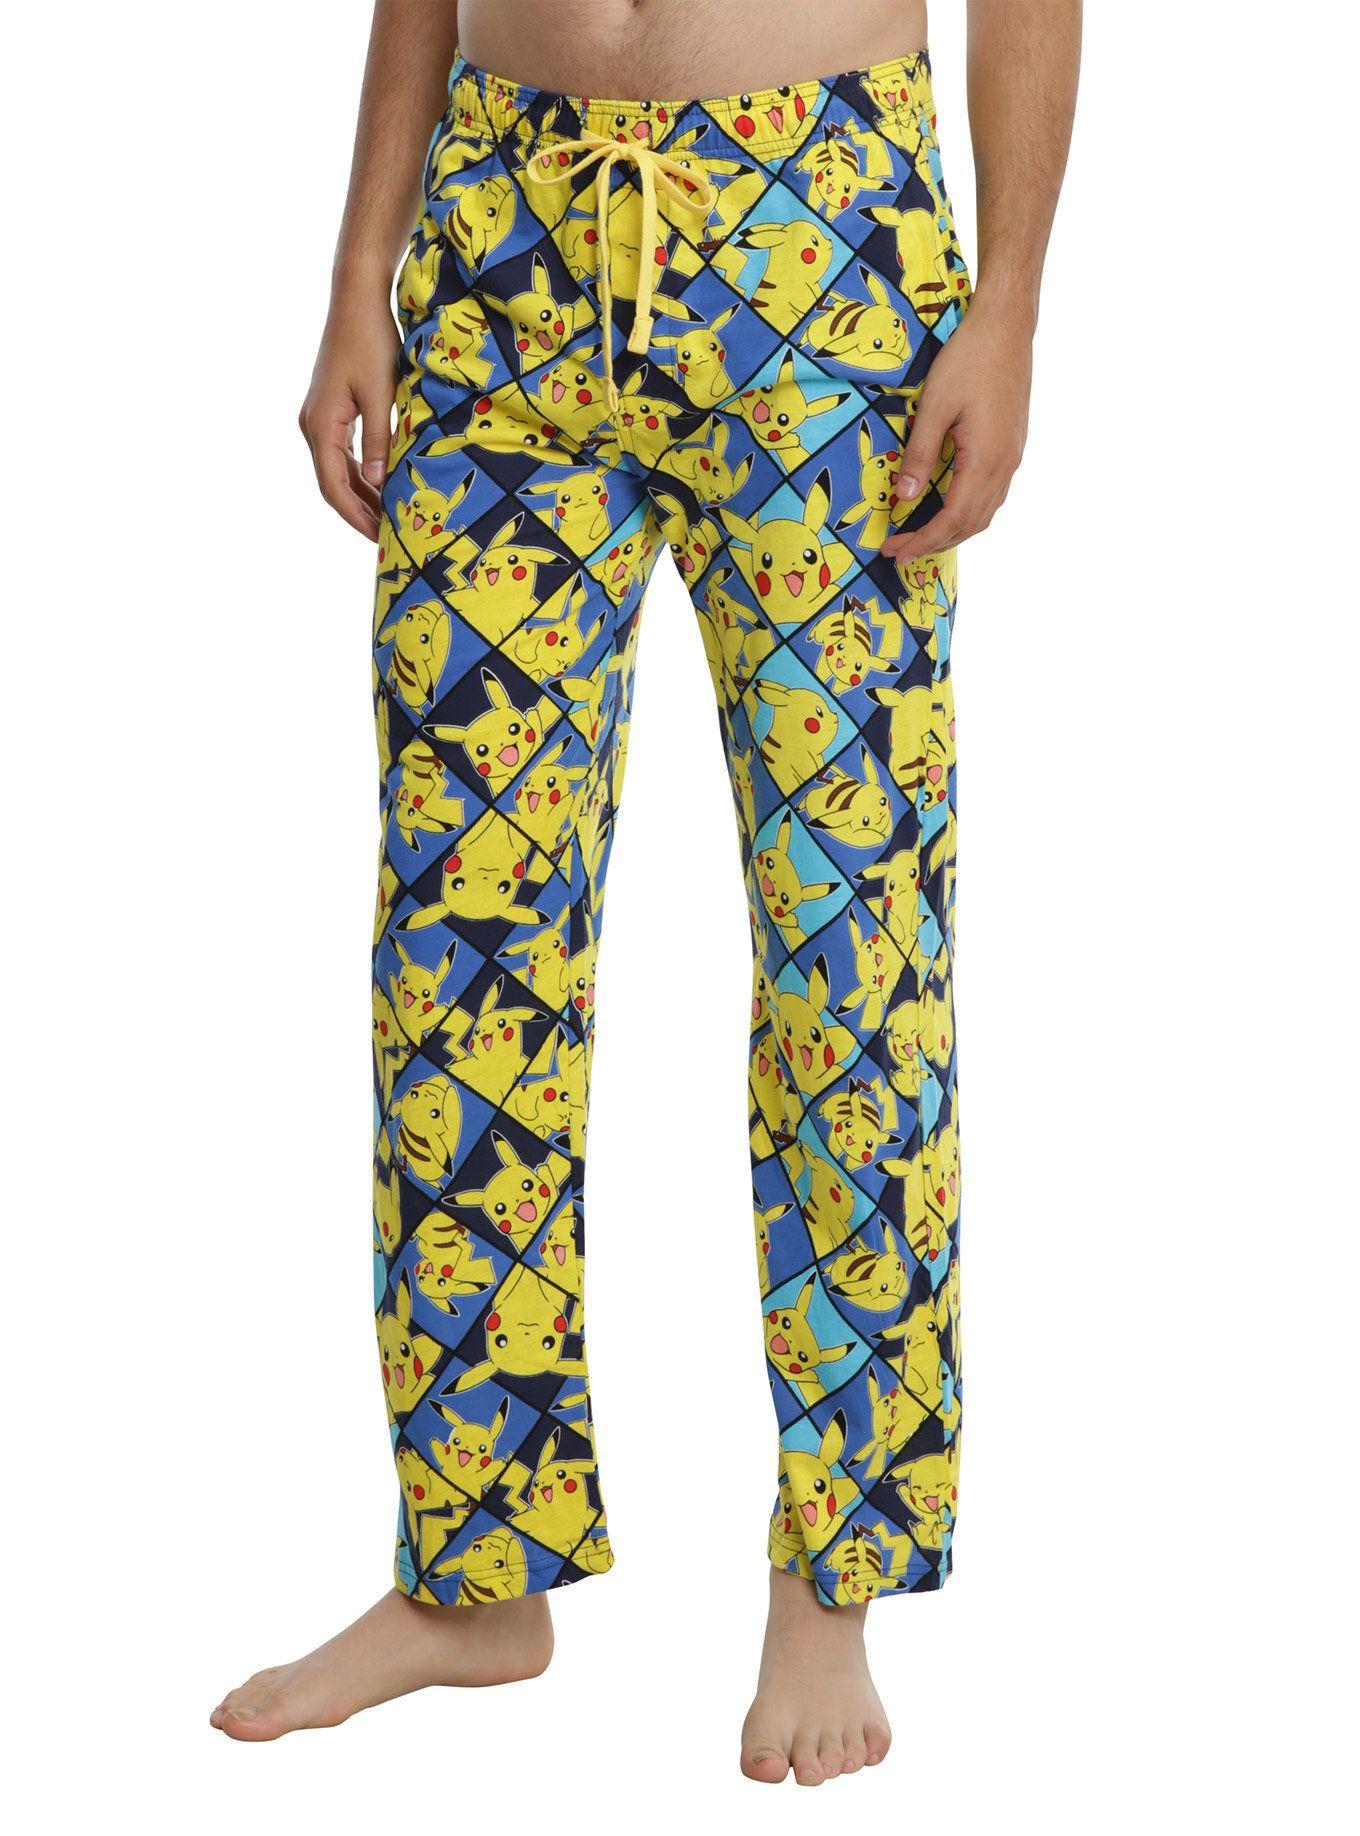 3f3f18604ad5 Pokemon Pikachu Print Guys Pajama Pants in 2019